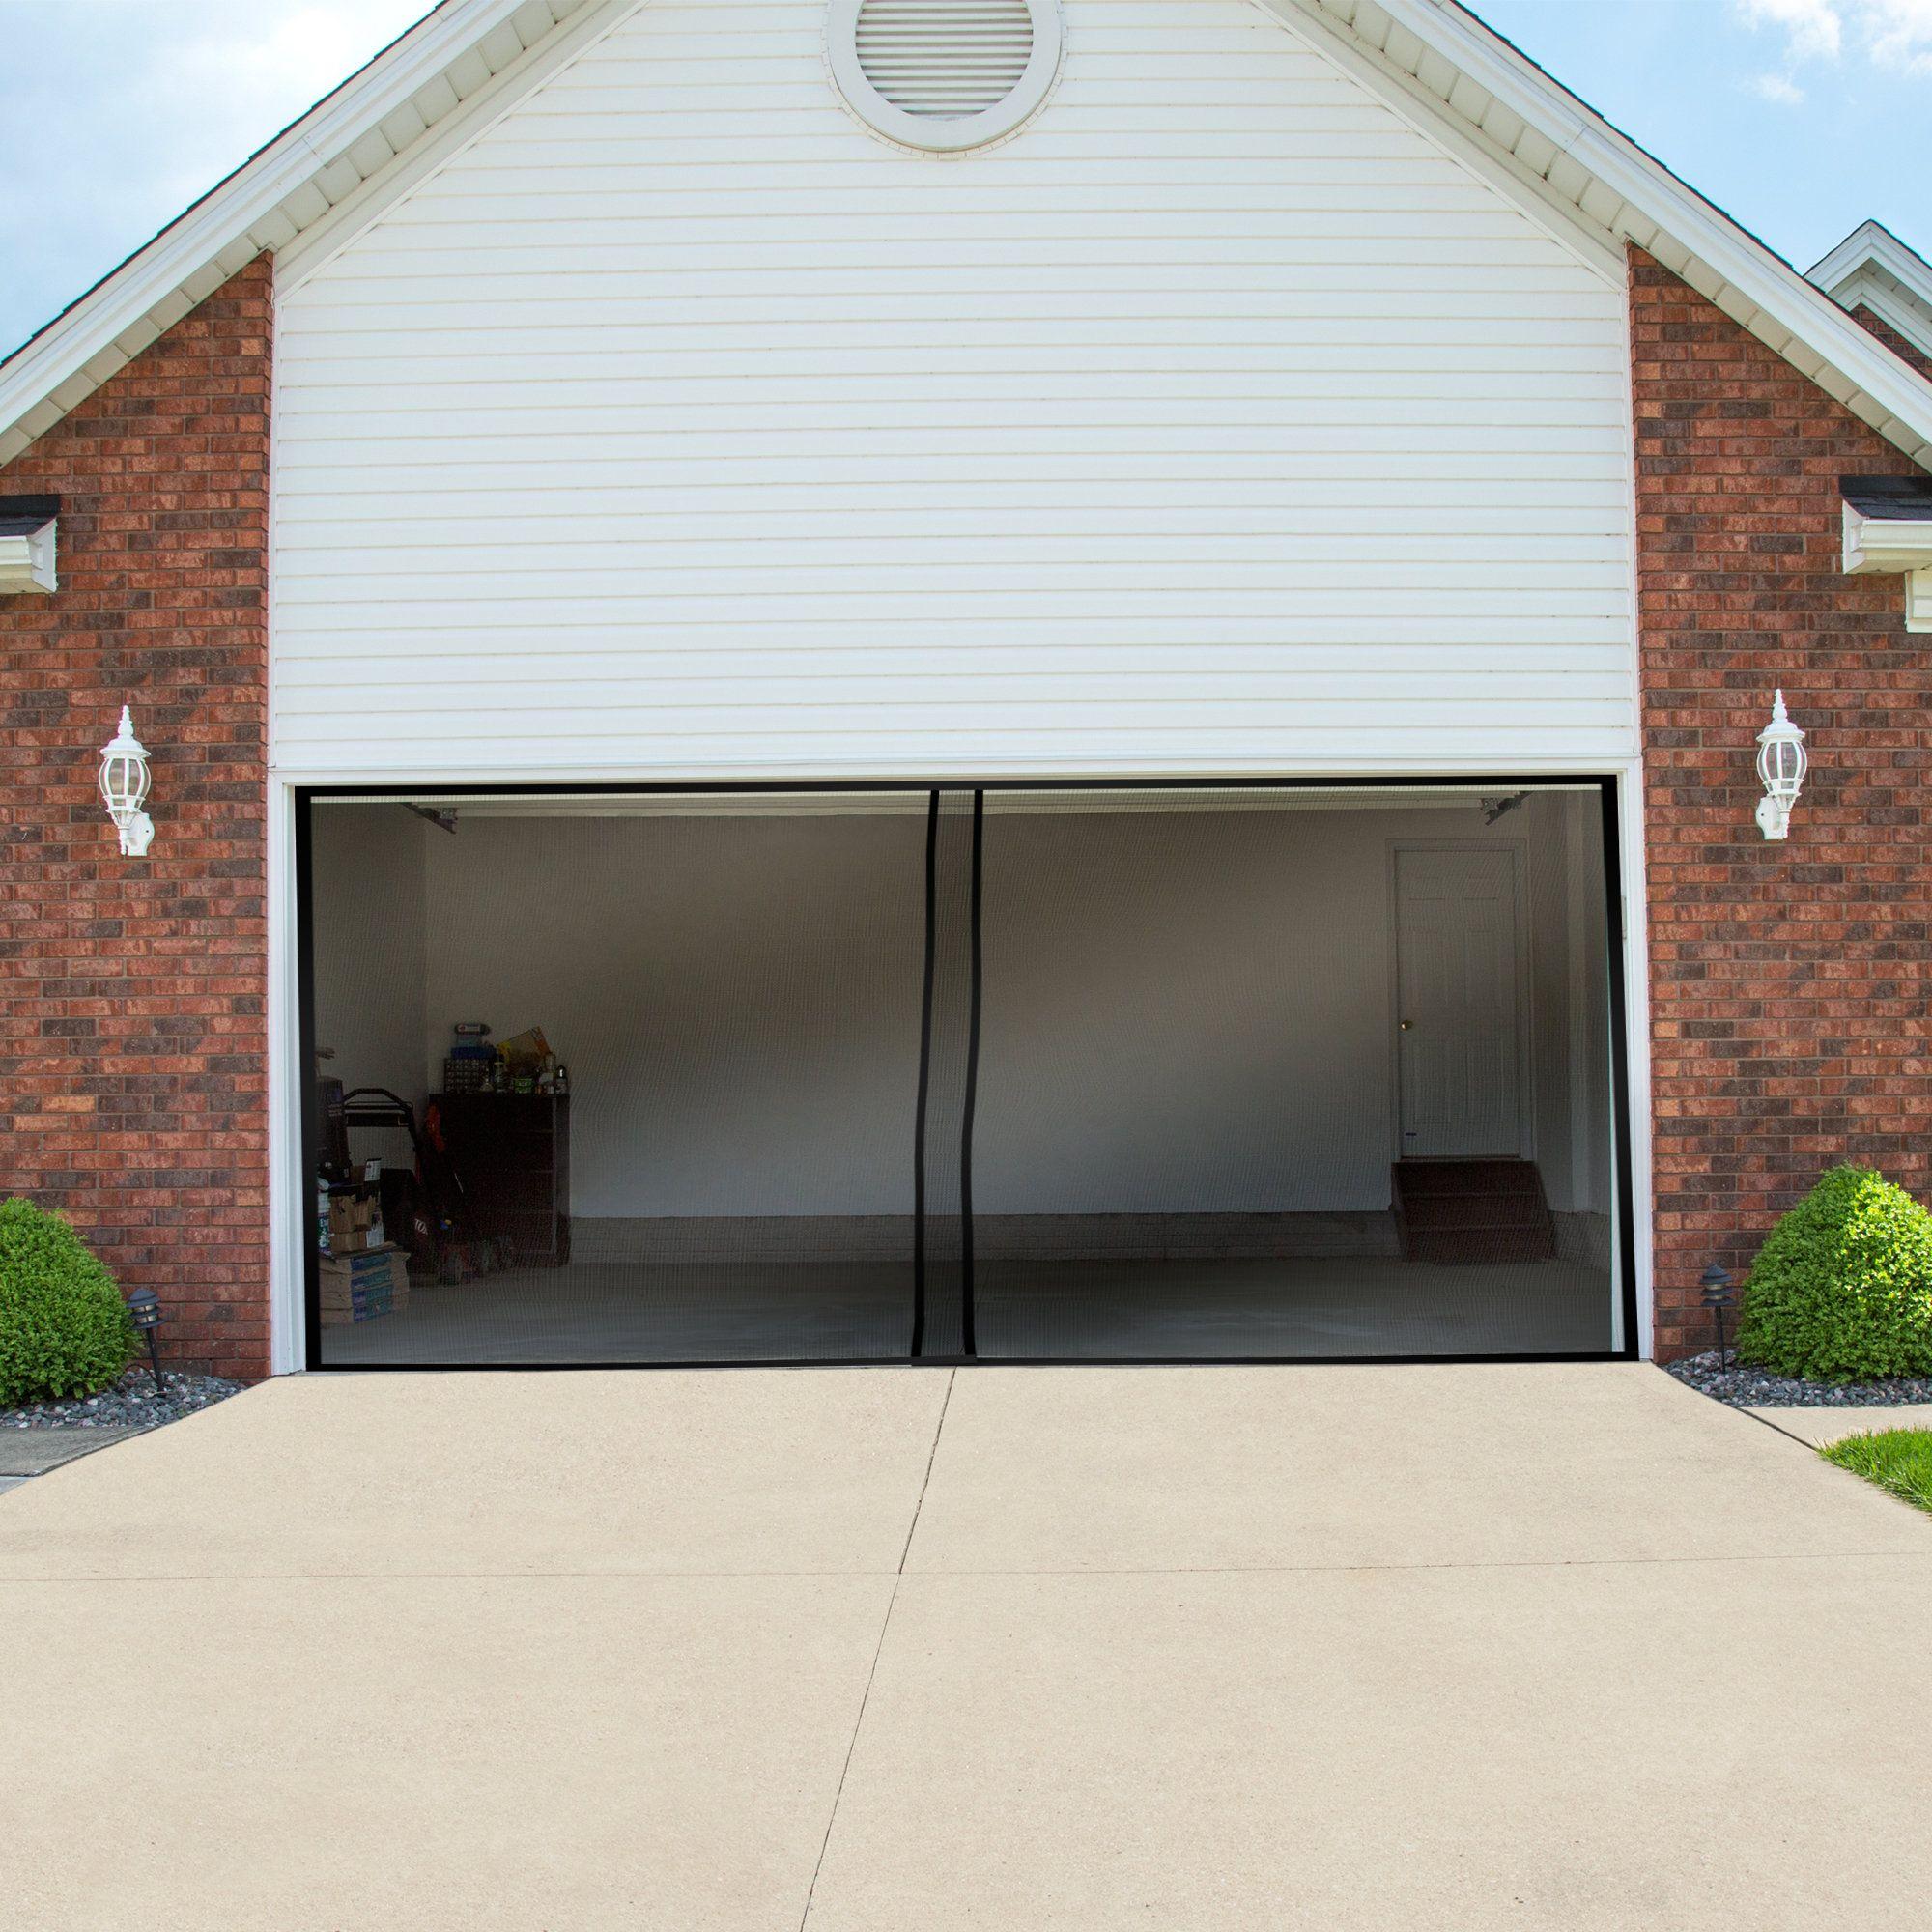 doors sjm garage two marvelous s stupendous rare concept gorgeous luxury door cost car